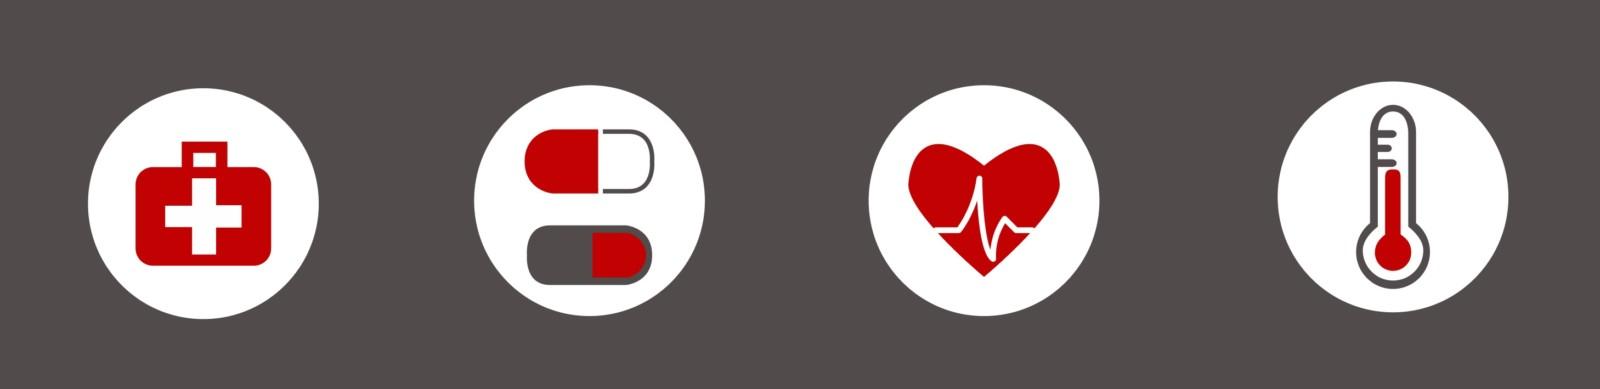 Medical Icon Image